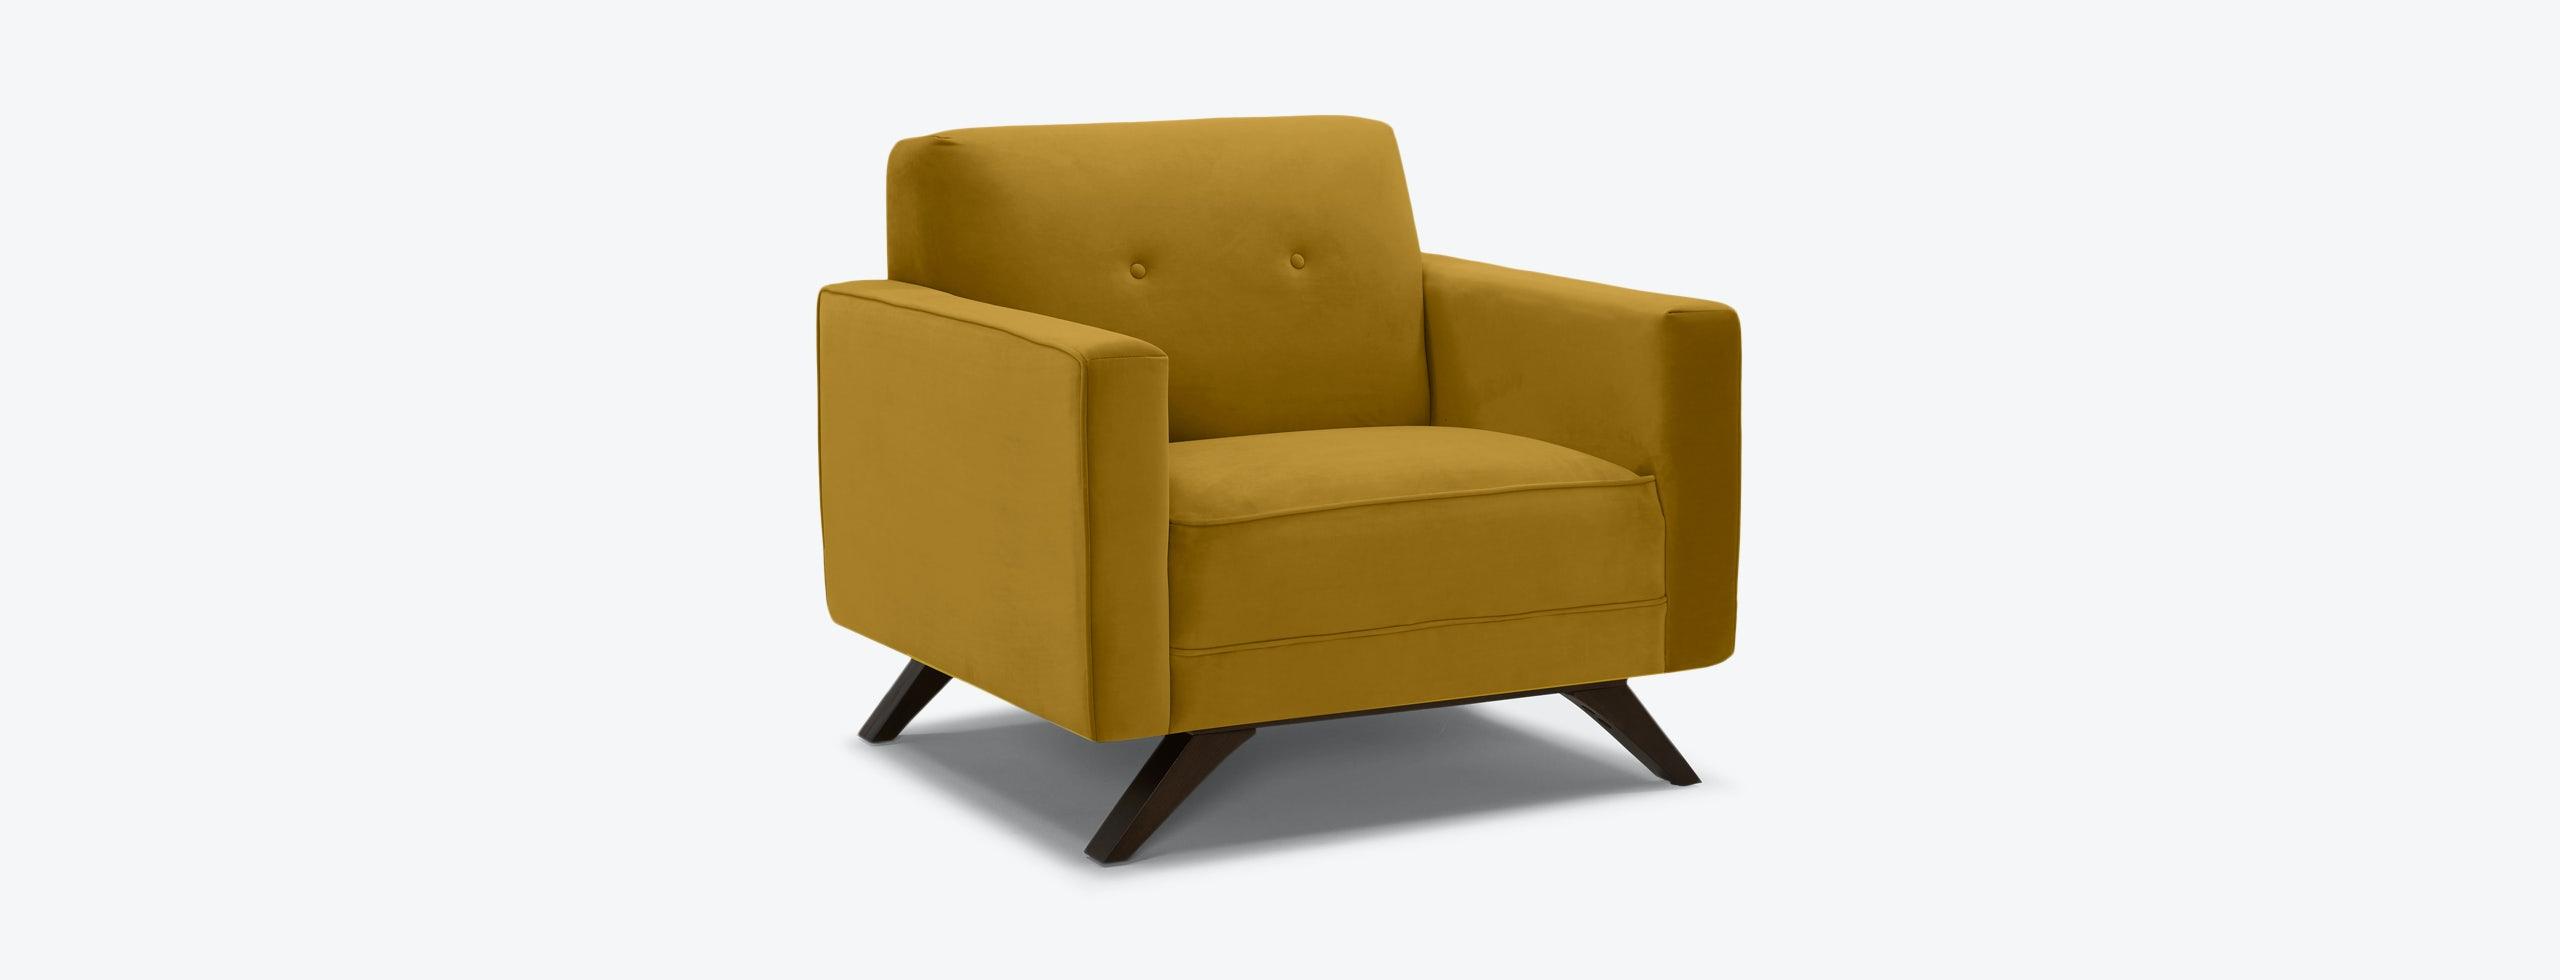 Roddy Chair Sorrento Marigold